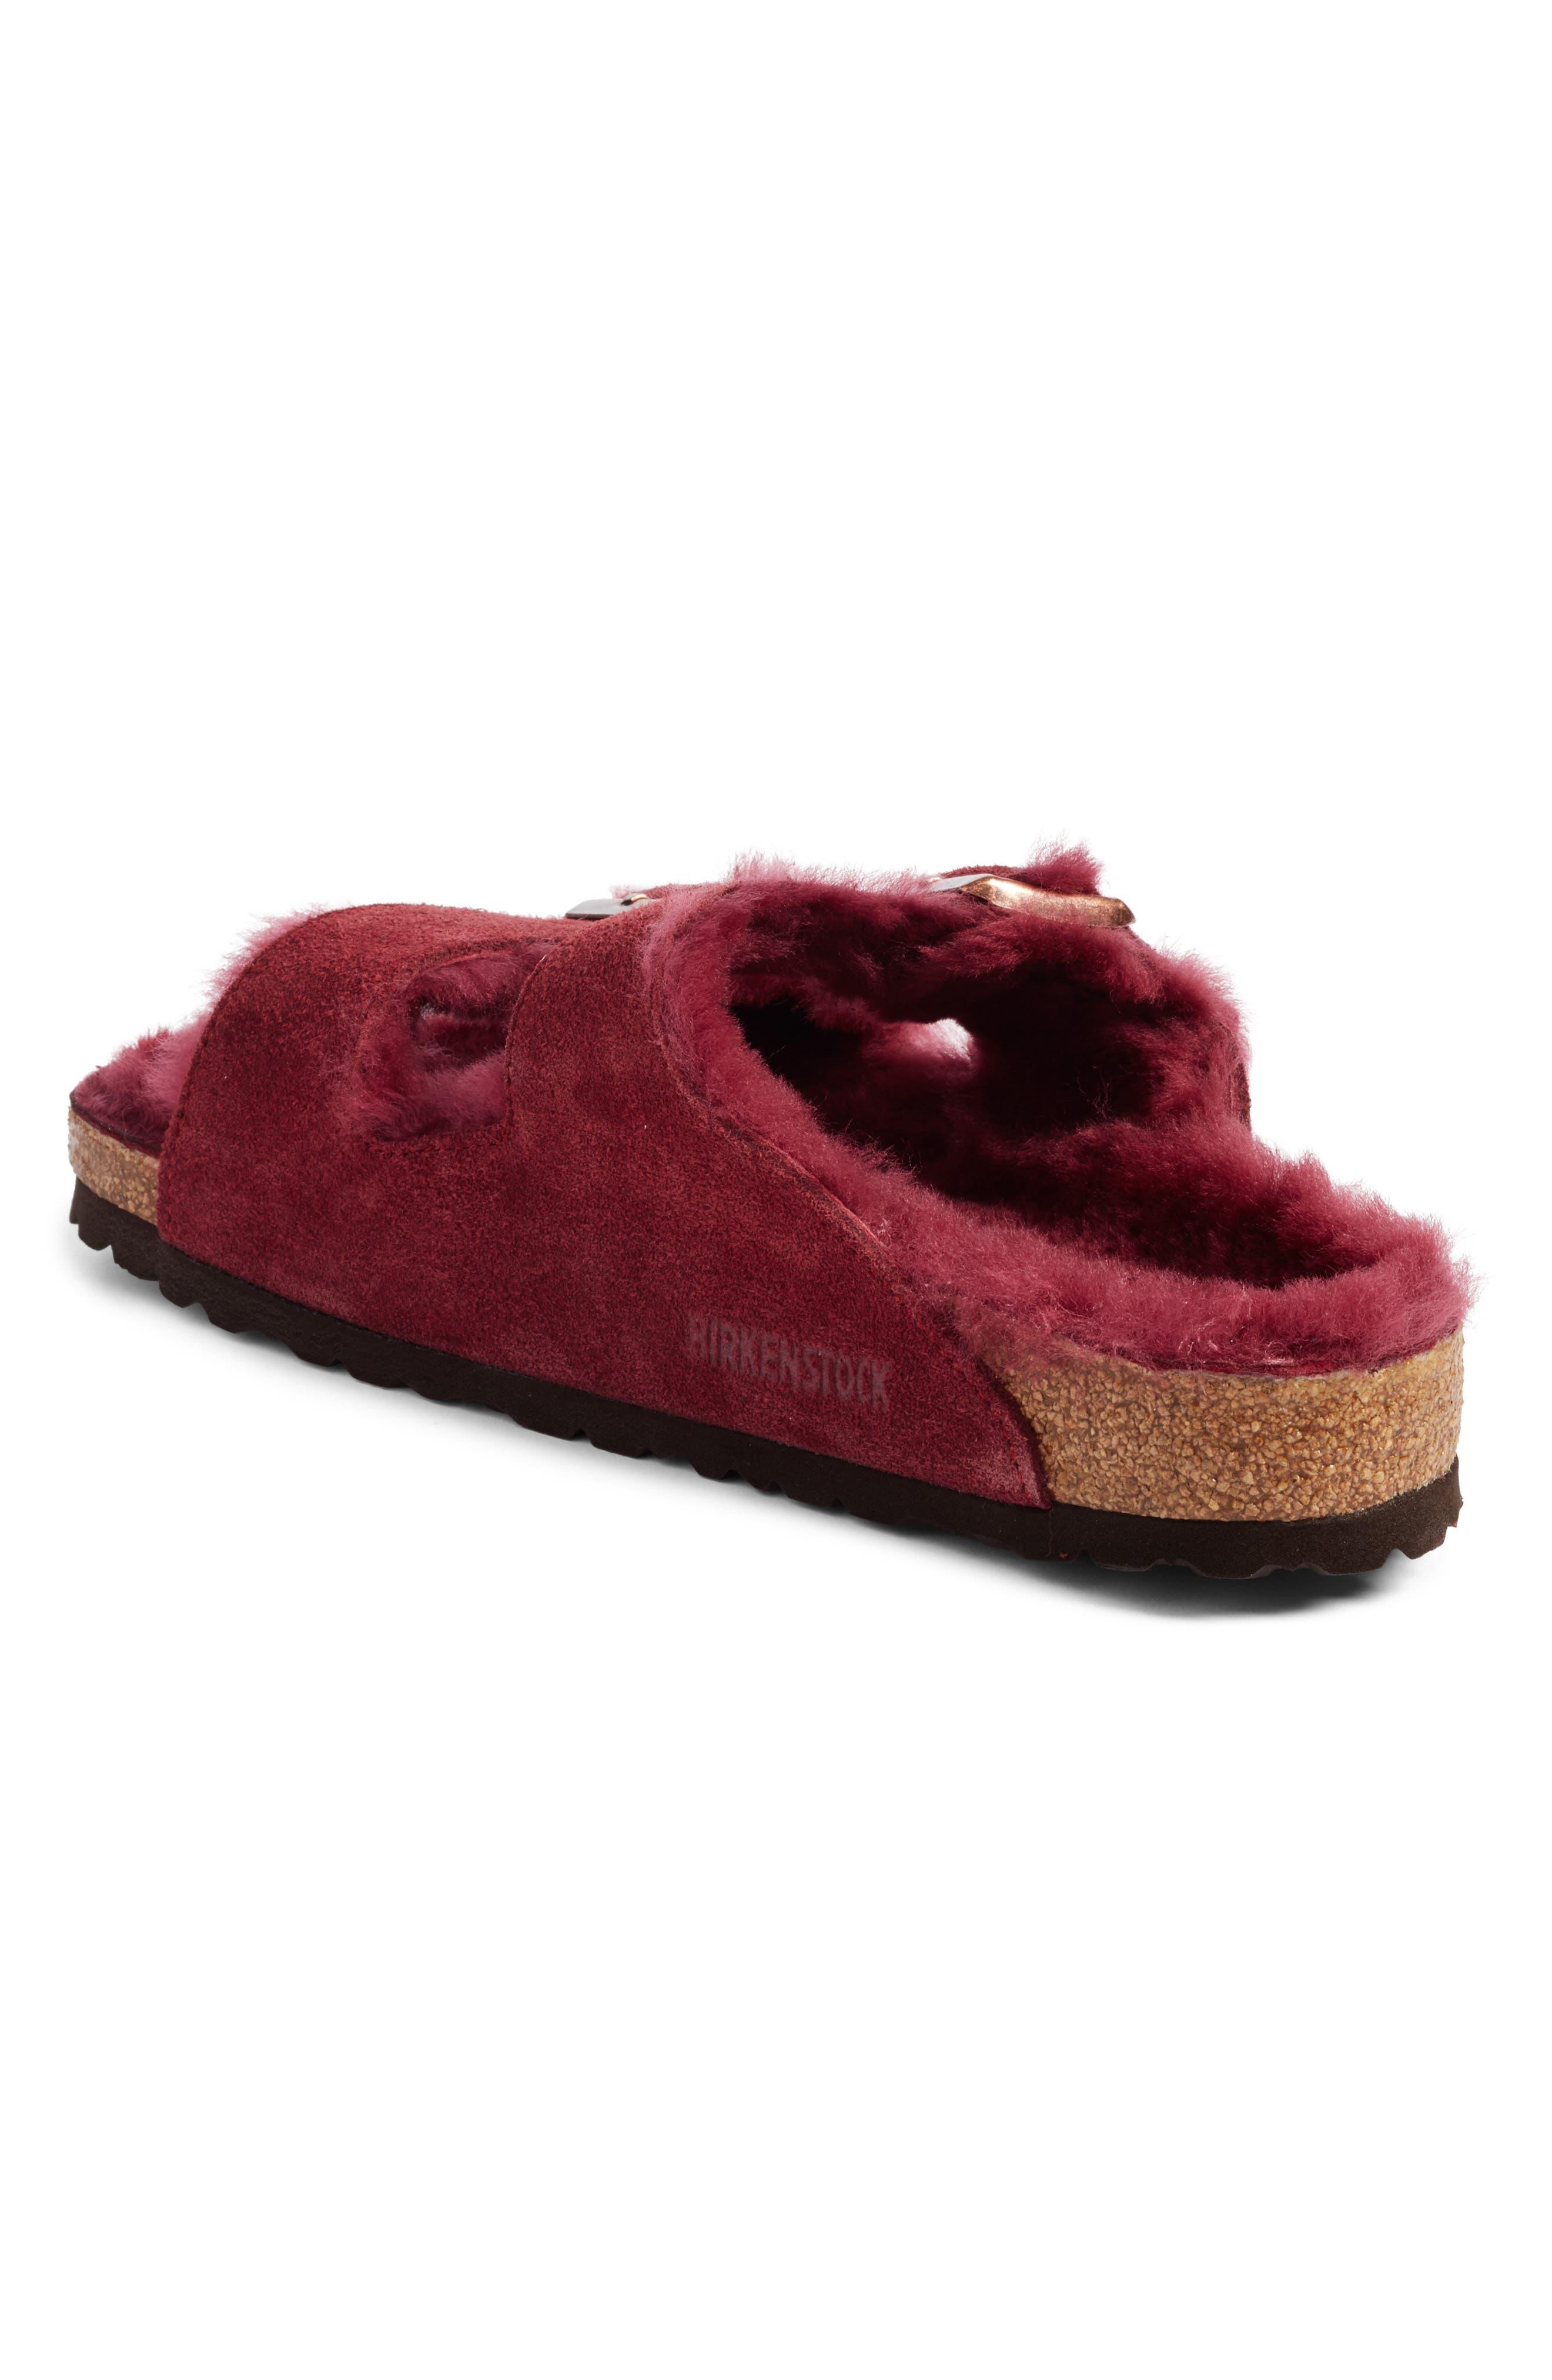 Arizona Genuine Shearling Lined Slide Sandal,                             Alternate thumbnail 2, color,                             930